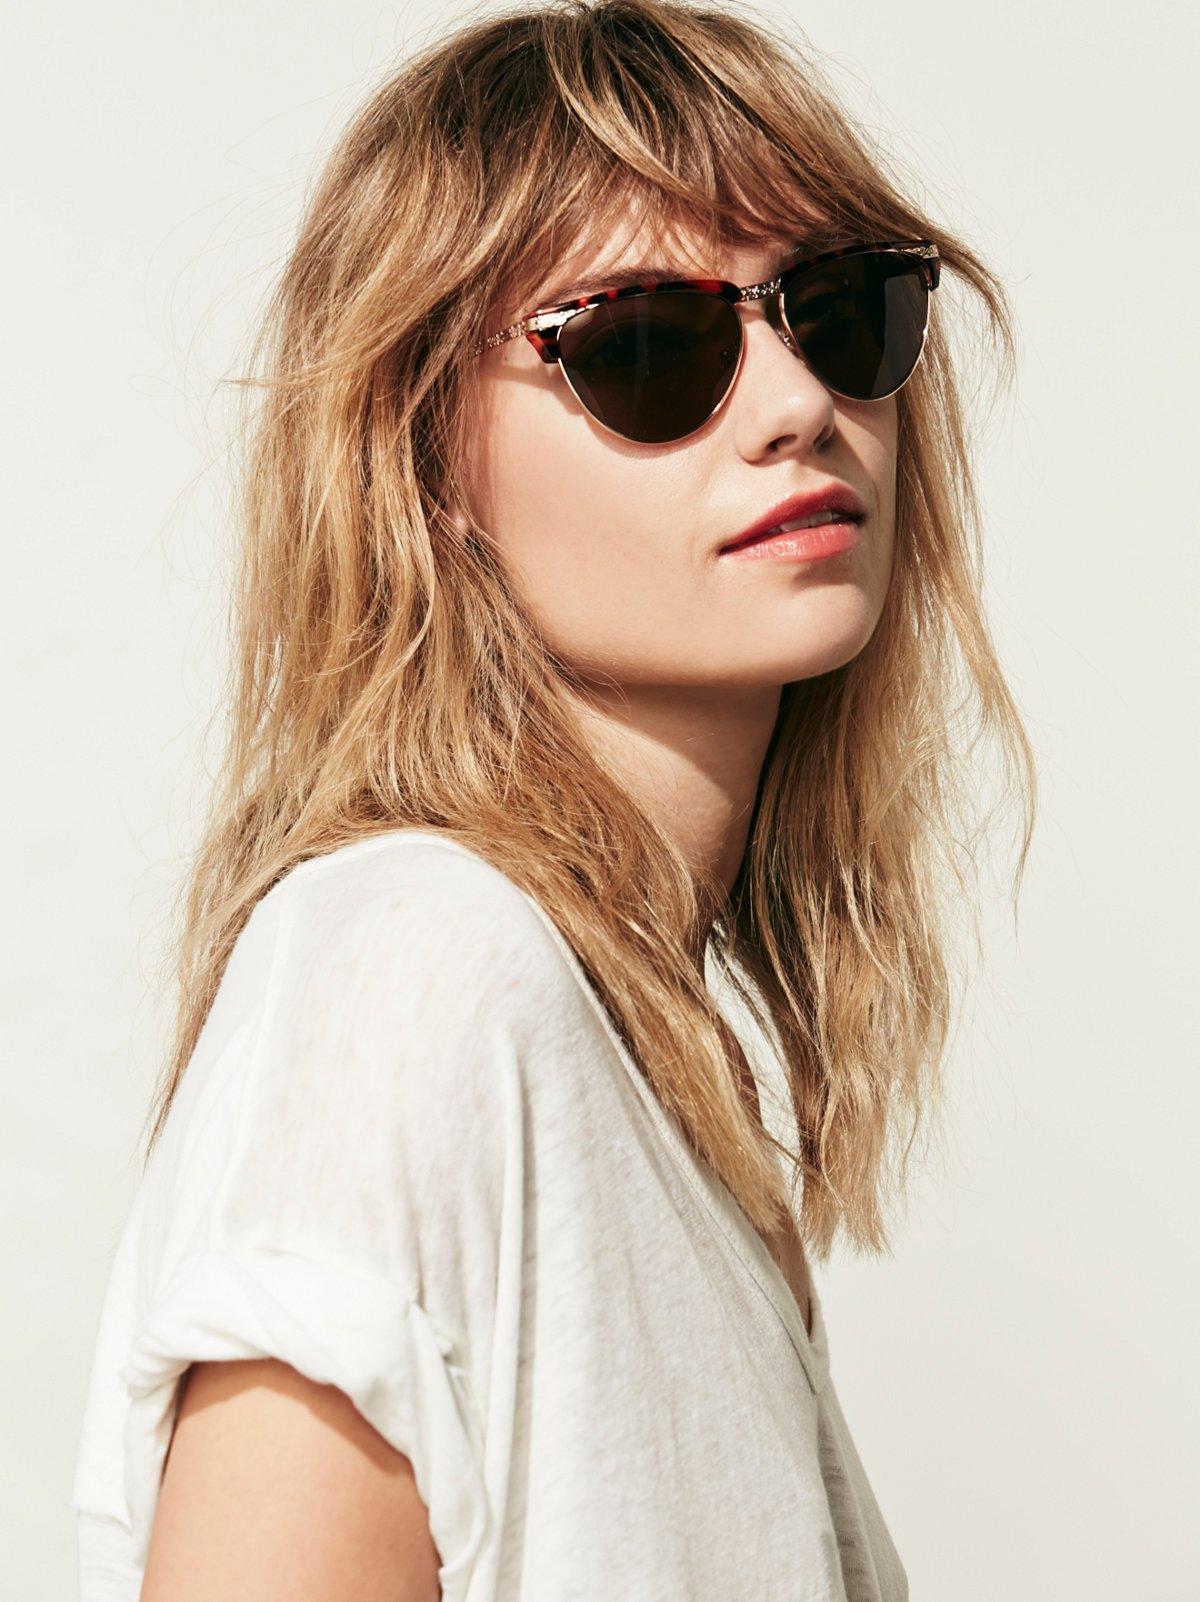 Friendly Sunglasses